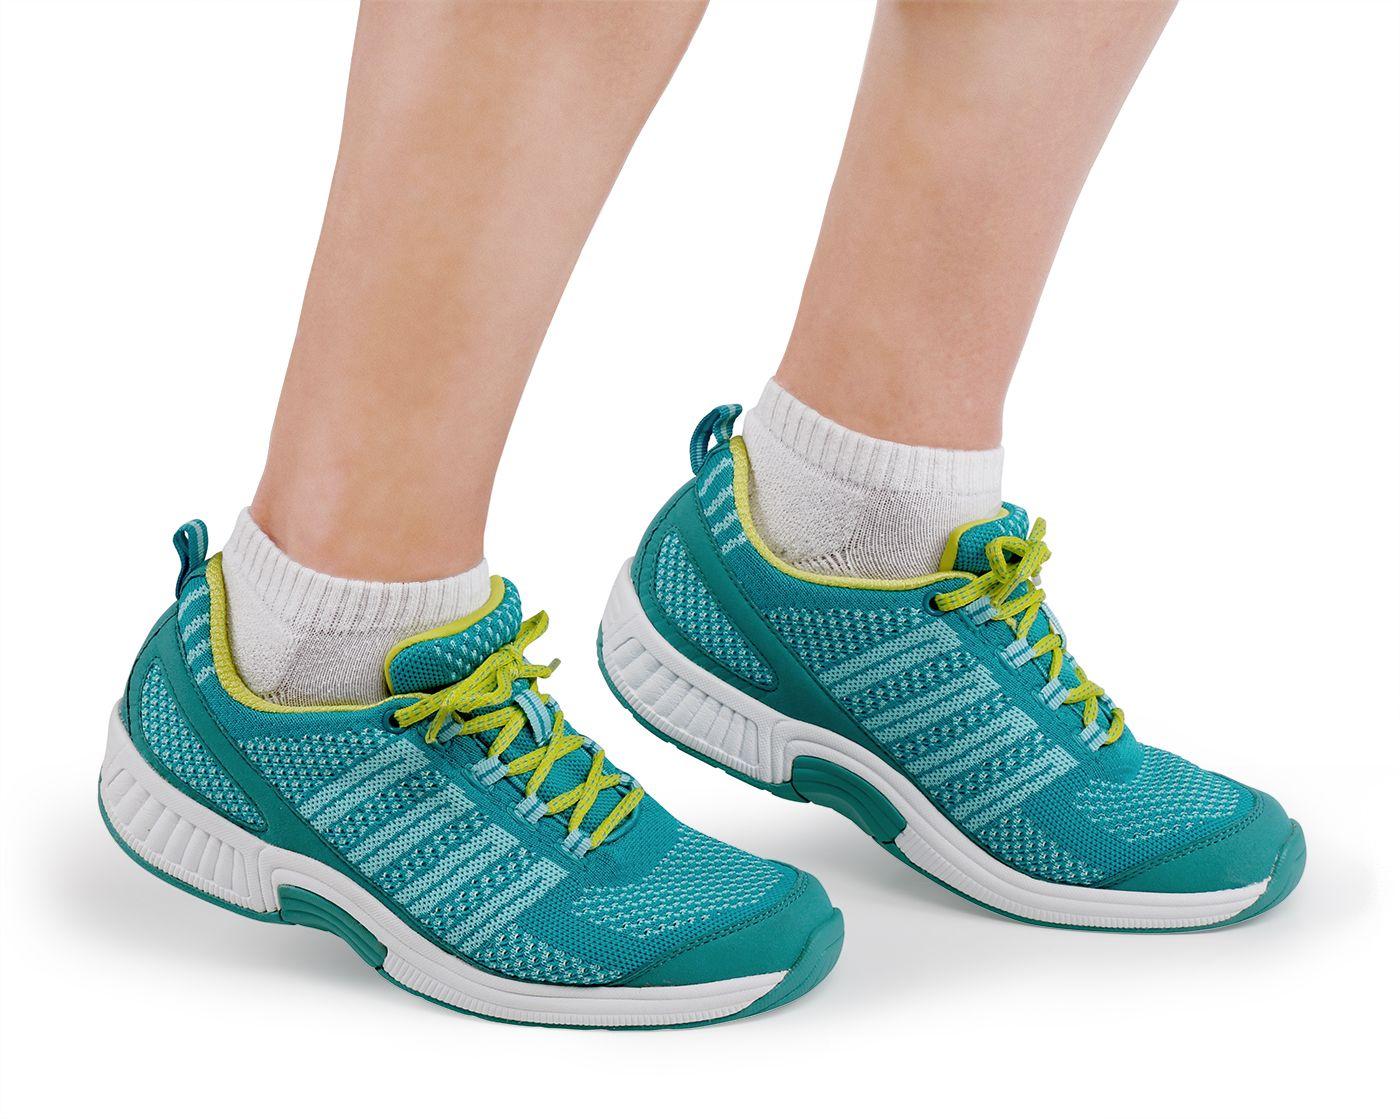 Women's Athletic Shoes Plantar